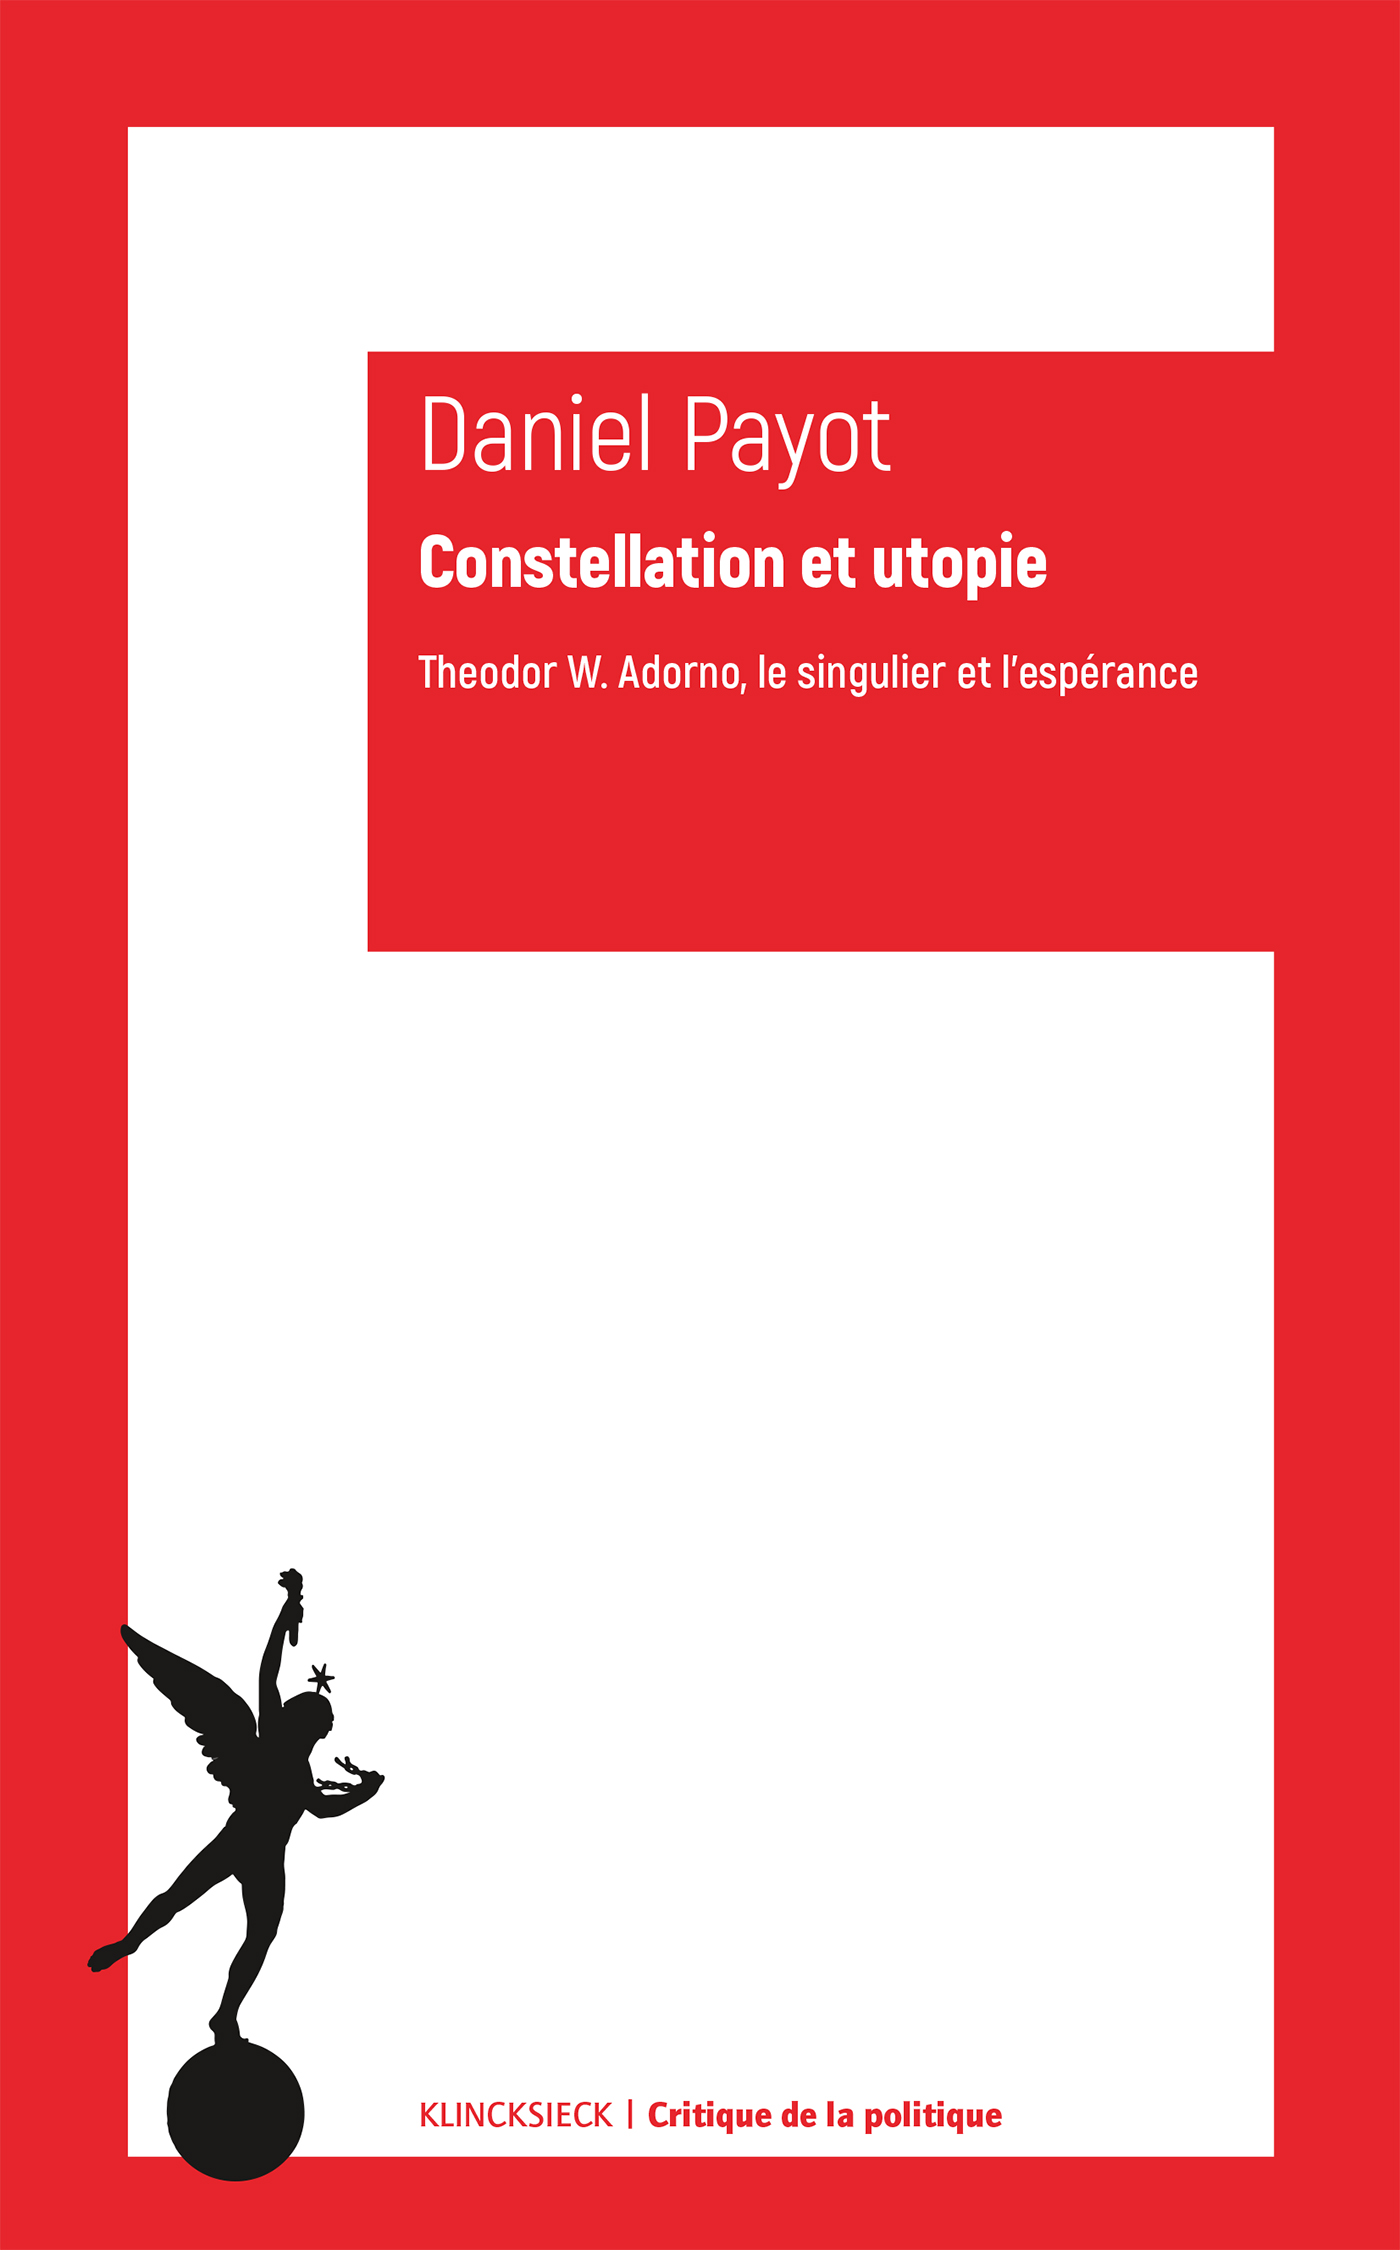 Constellation et utopie